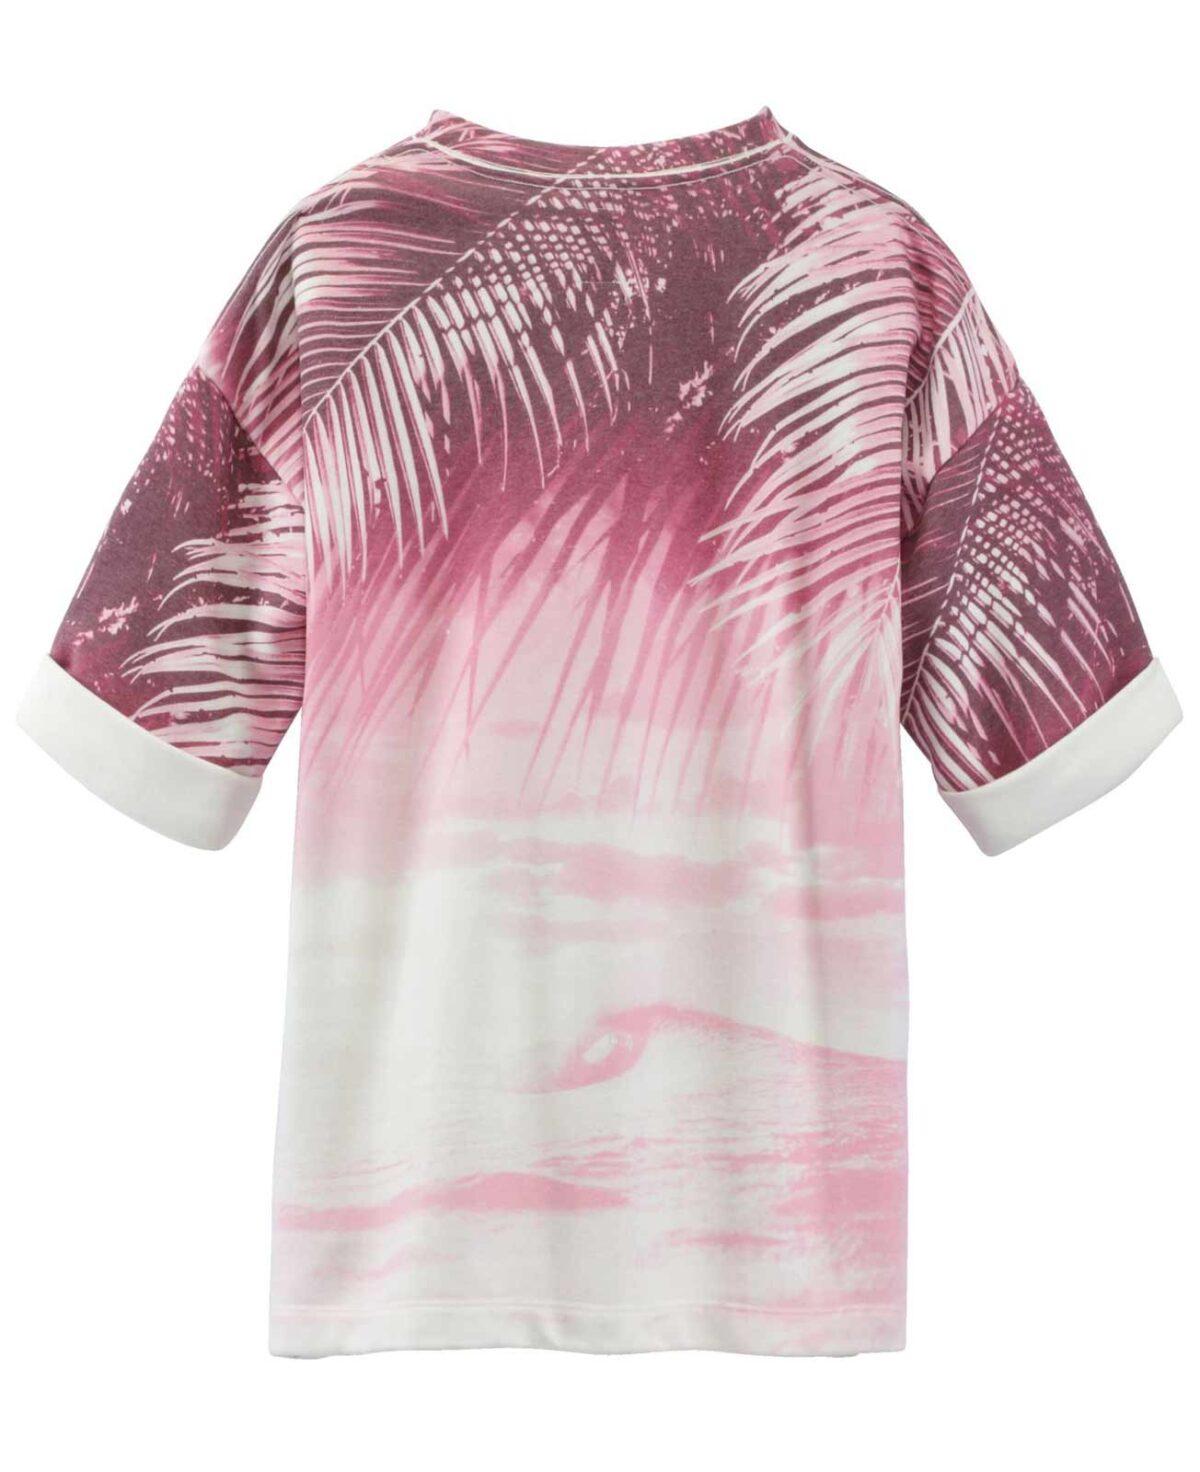 t shirts ohne ärmel REPLAY Damen-Sweatshirt Halbarm Rosa 726.400 Missforty